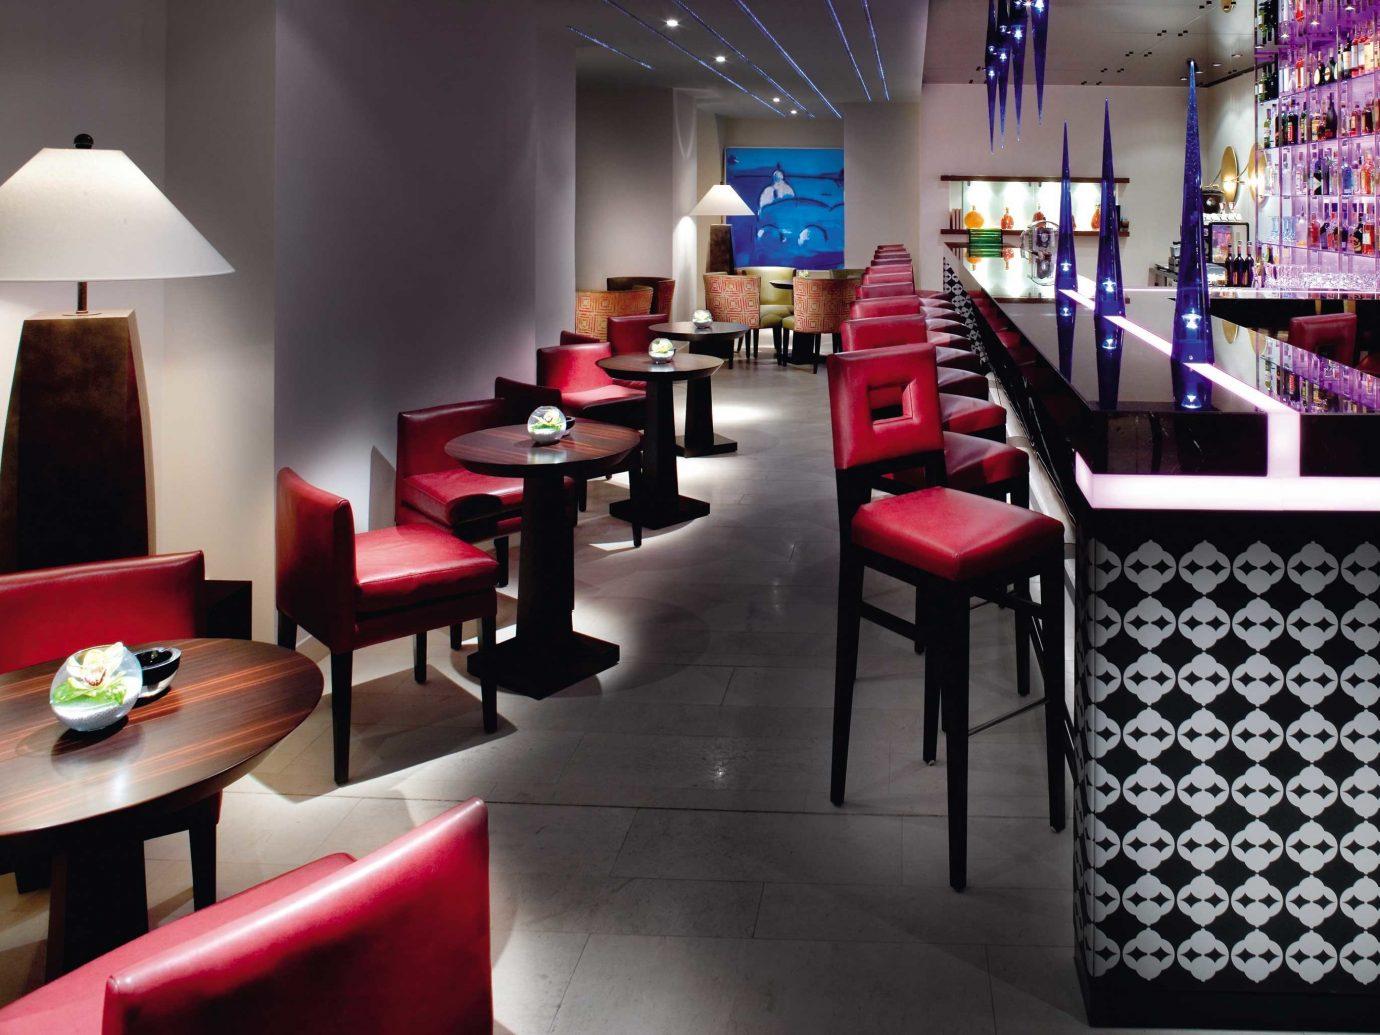 Bar Dining Drink Eat europe Hotels Luxury Modern Prague indoor table wall room floor Living restaurant red interior design furniture function hall Design Lobby dining room area several